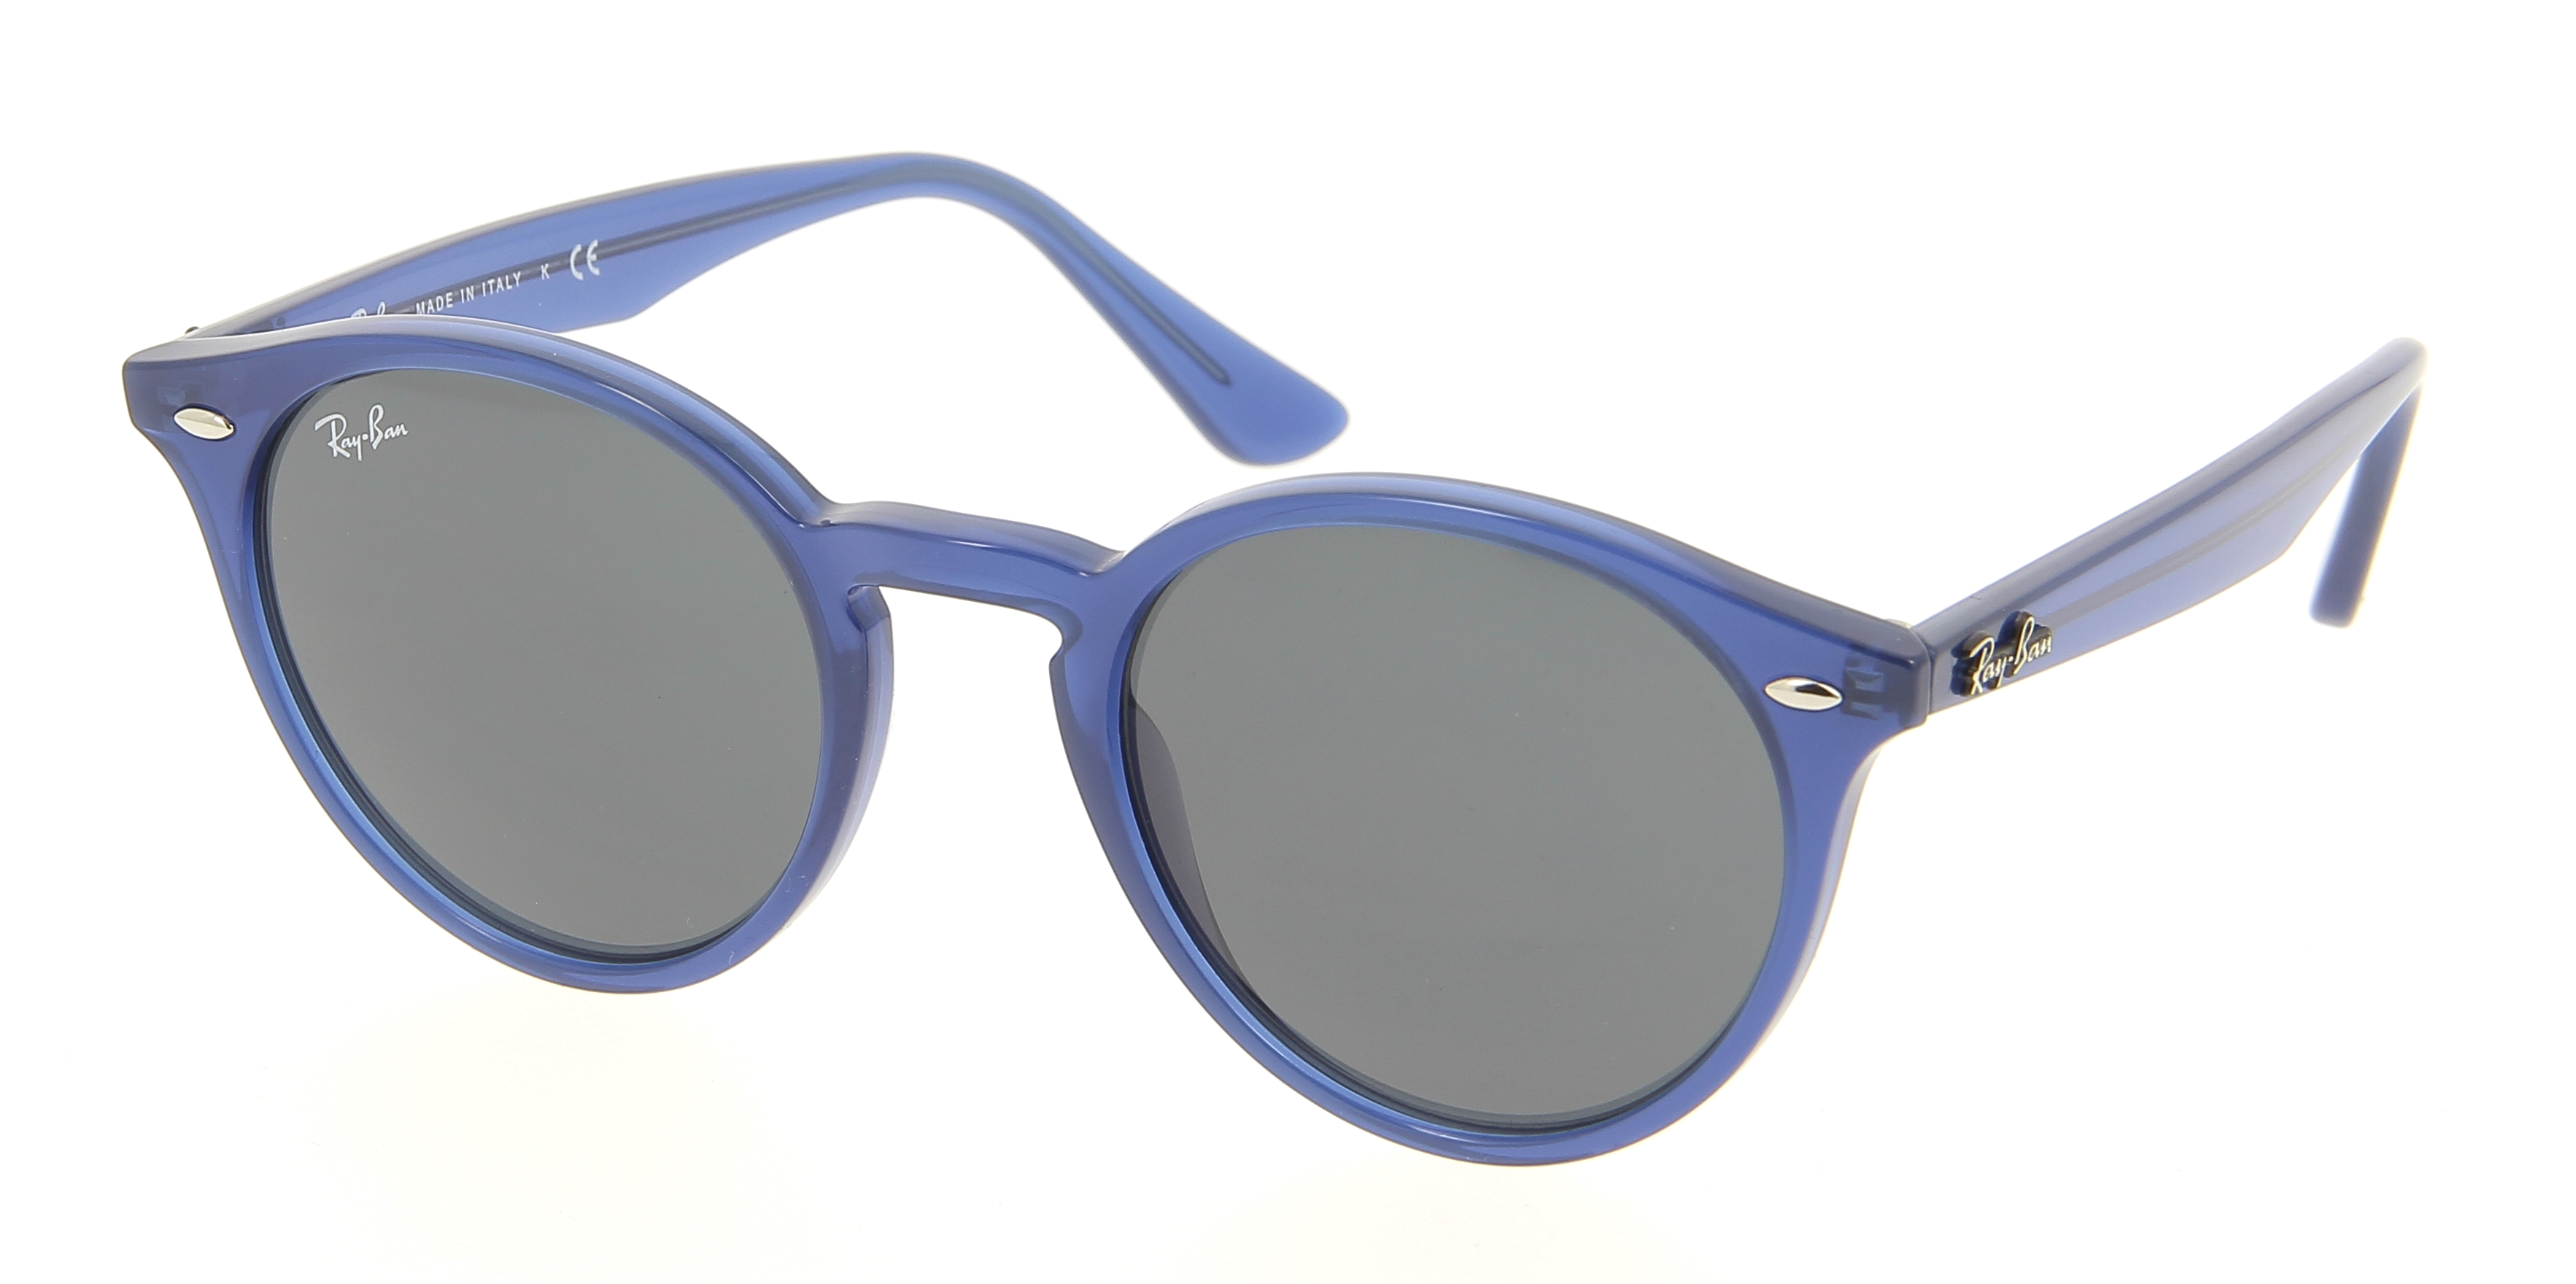 lunettes de soleil ray ban rb 2180 616587 49 21 mixte bleu. Black Bedroom Furniture Sets. Home Design Ideas